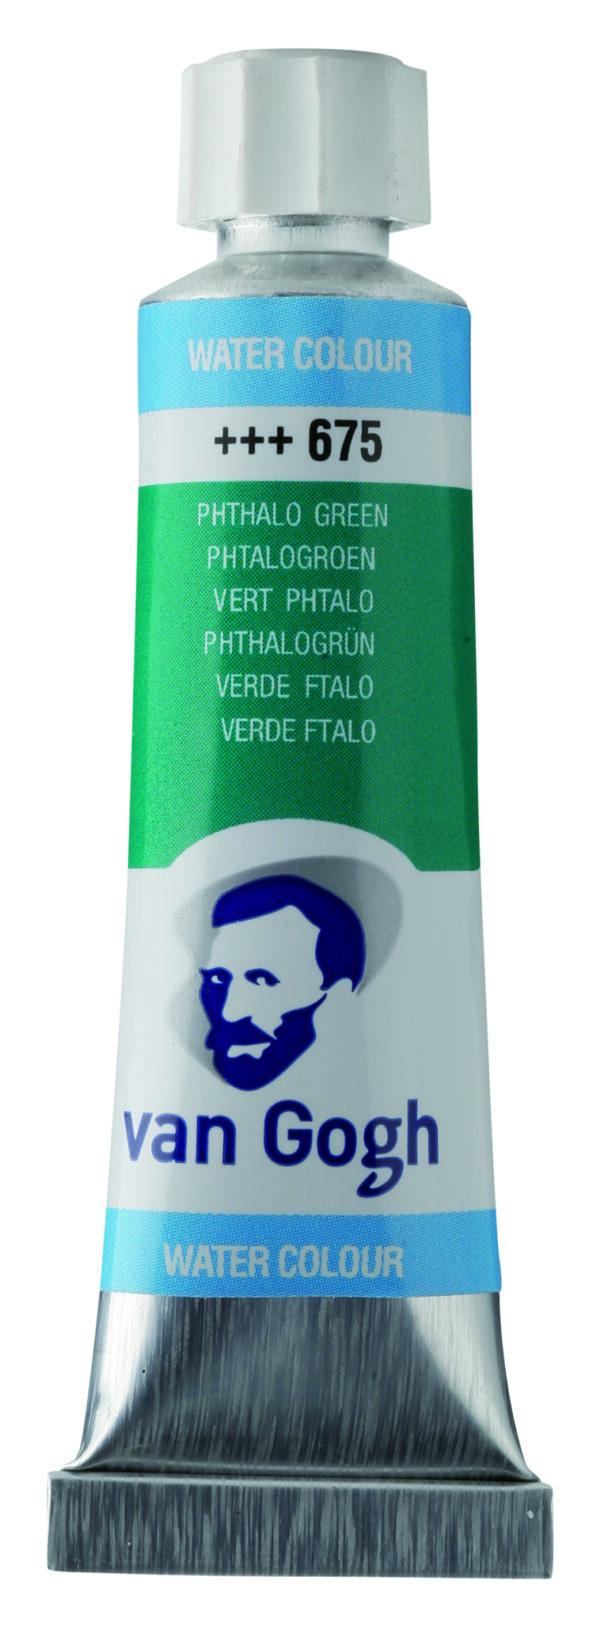 Van Gogh 675 Phthalo green - 10 ml